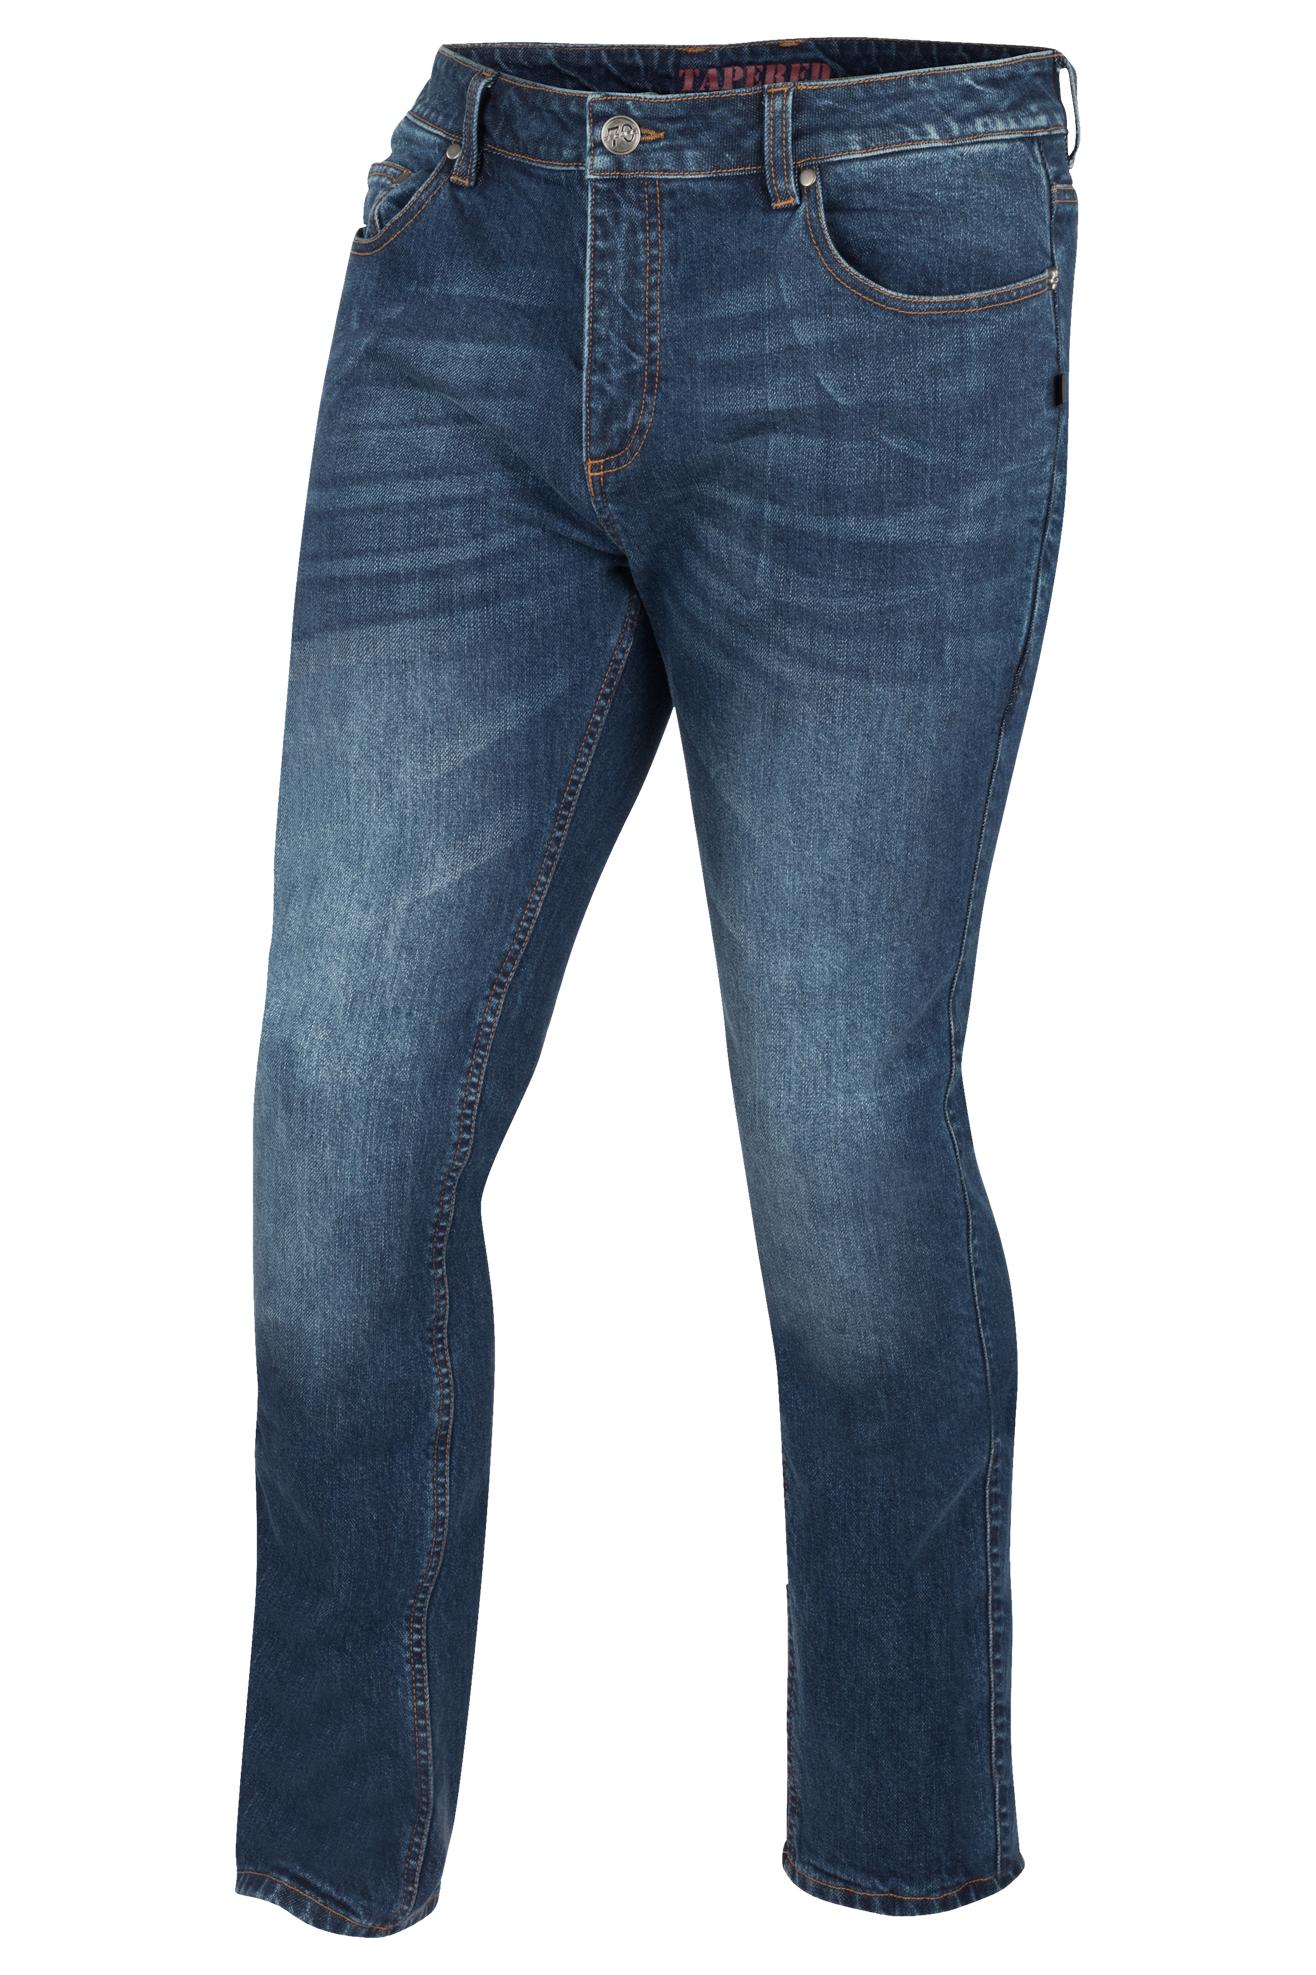 Segura Jeans Moto  Vertigo Blu Lavato